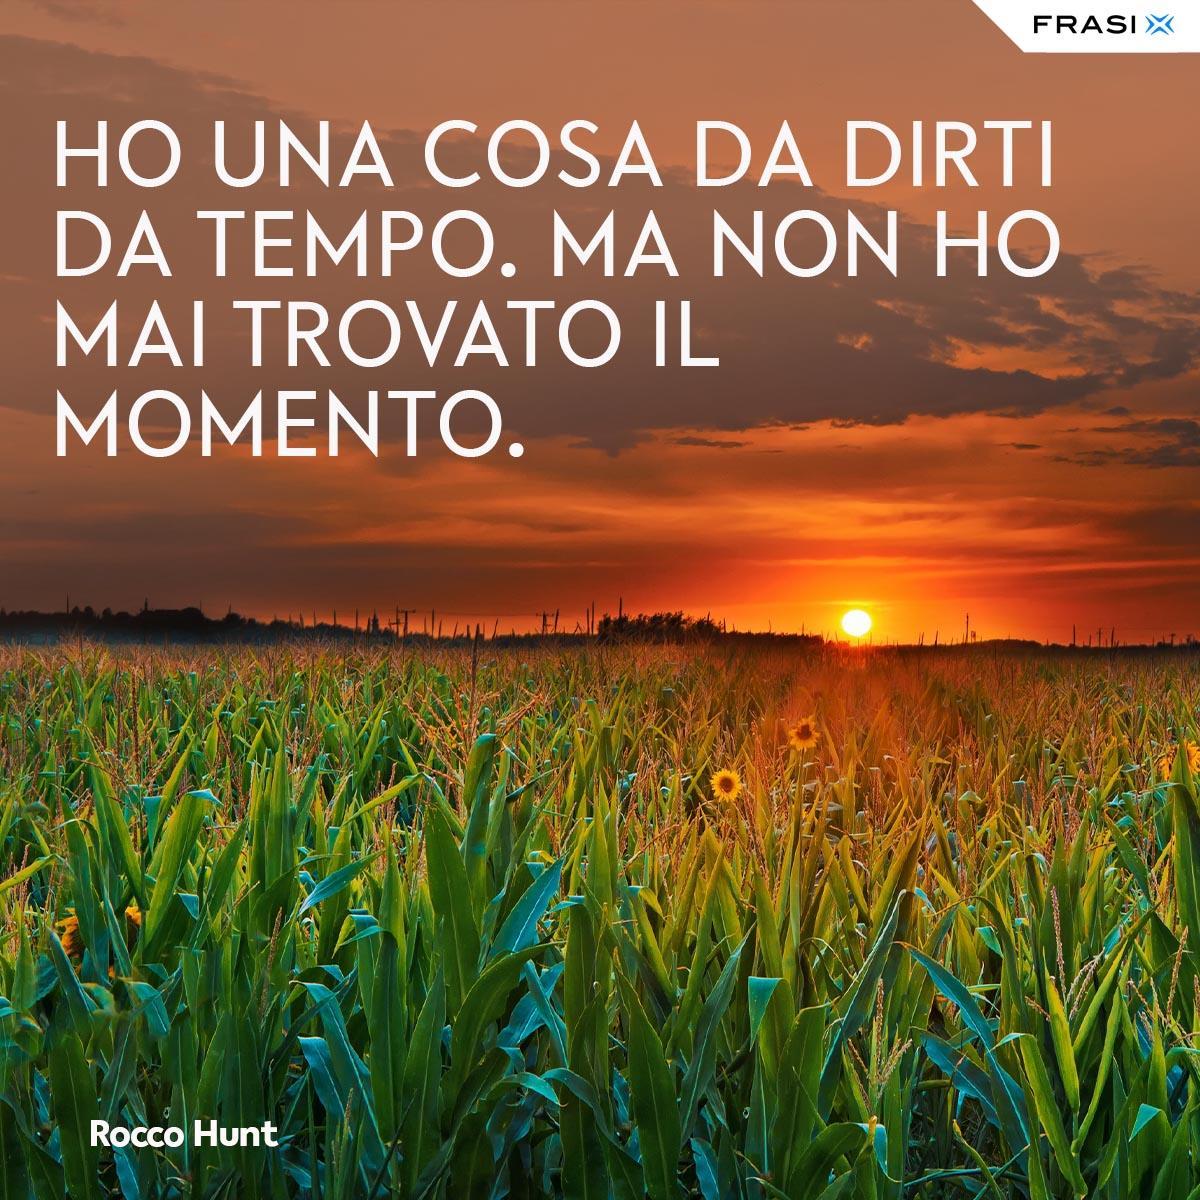 Frasi tumblr canzoni Rocco Hunt